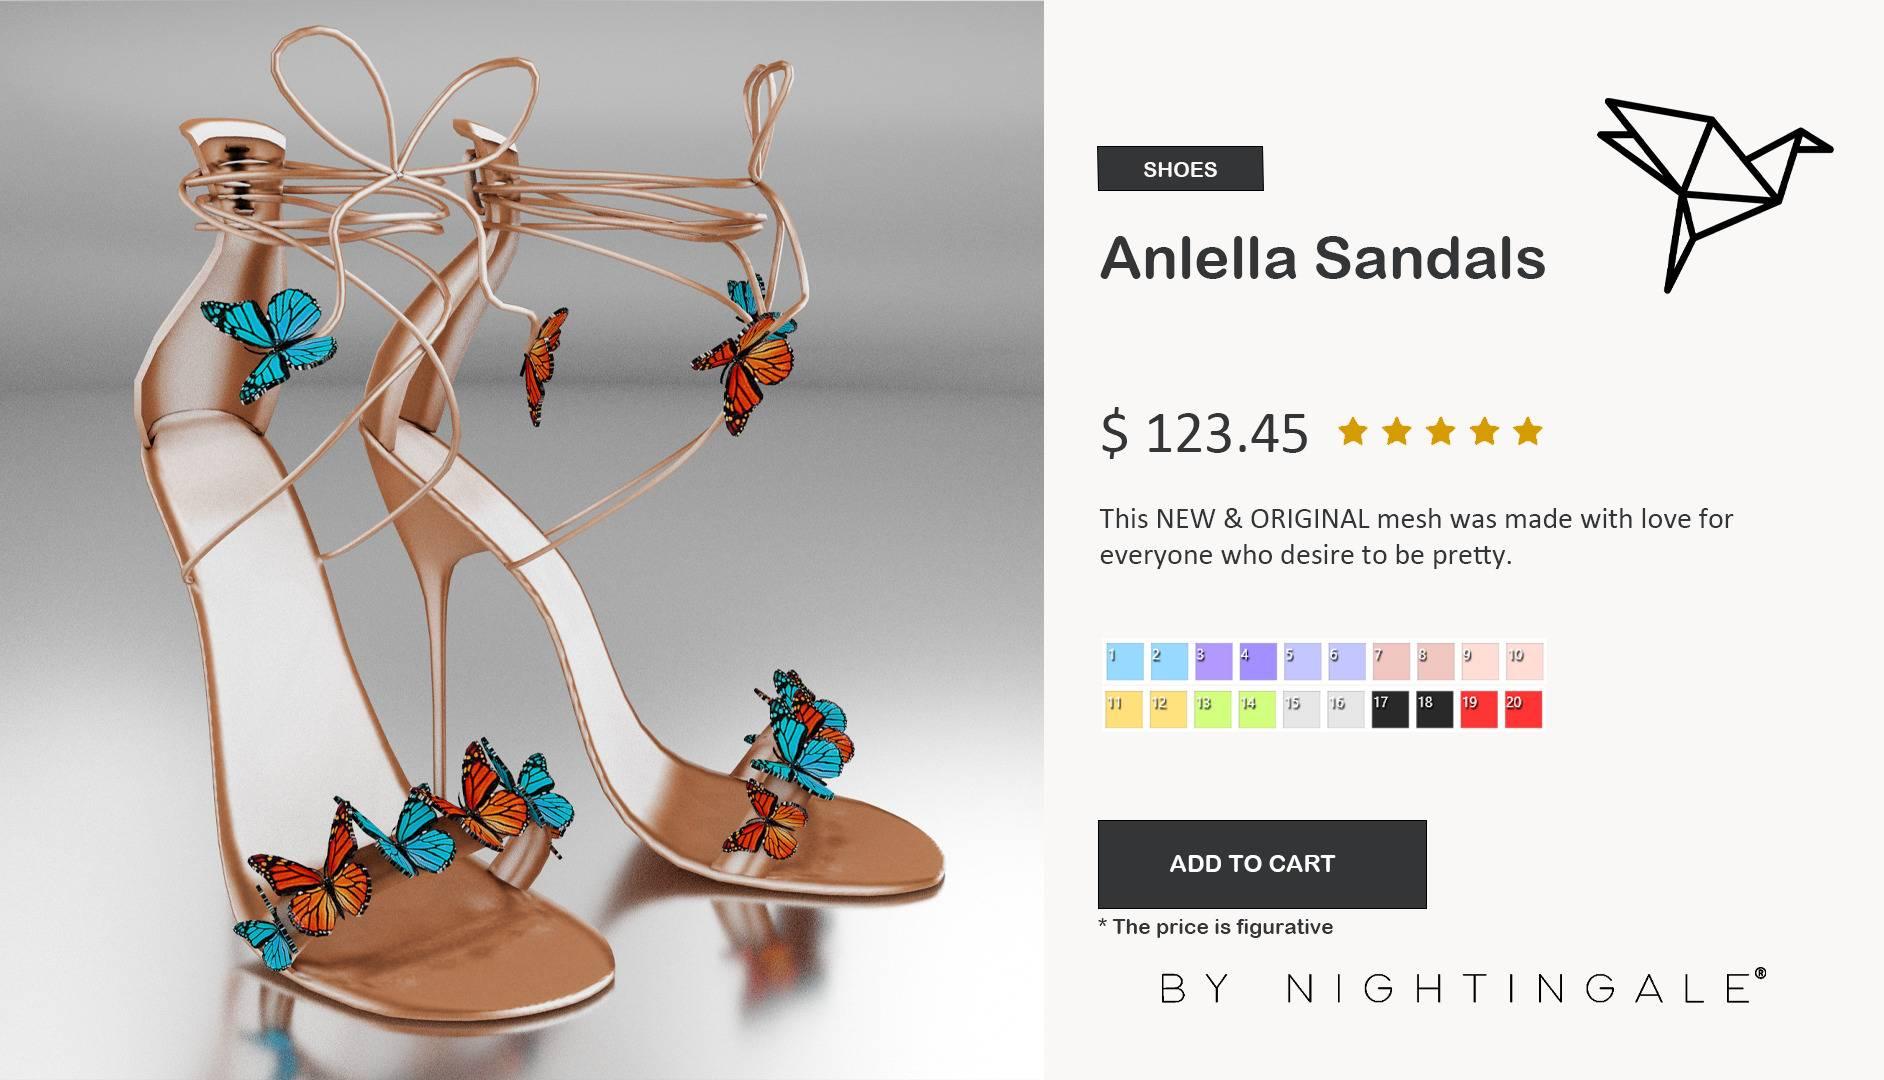 Босоножки - Anlella Sandals